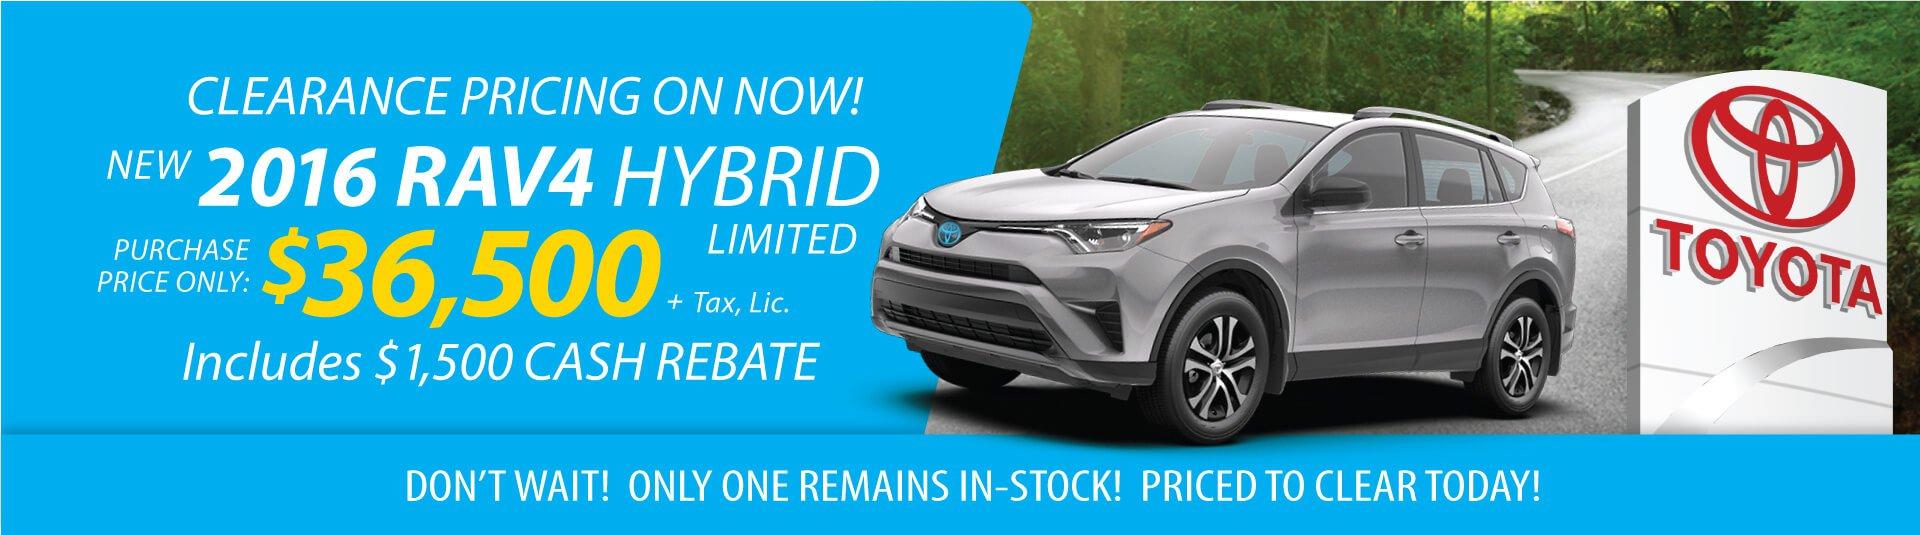 2016 RAV4 Hybrid Clearance